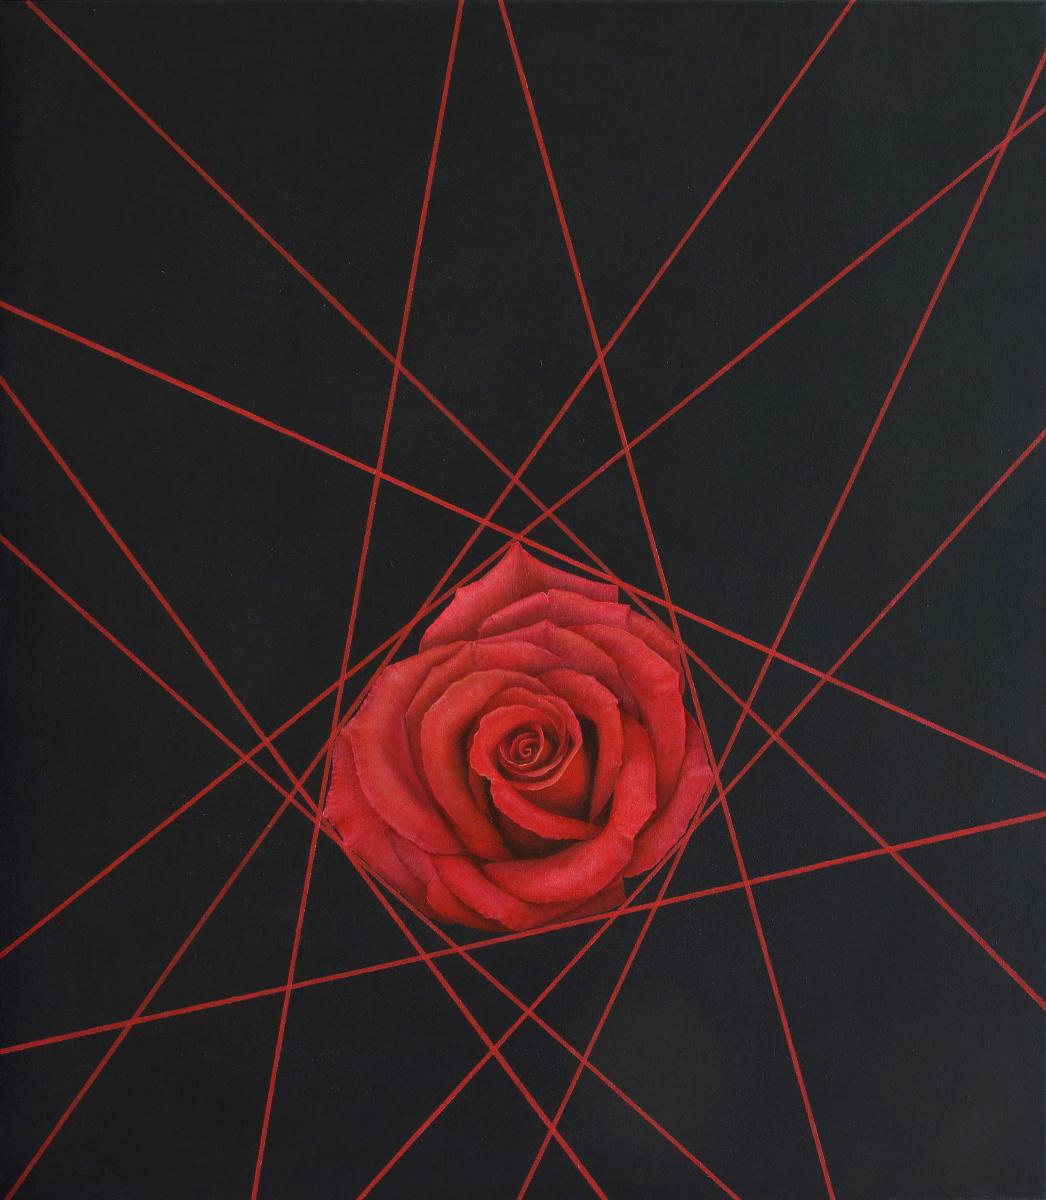 Natalia Bagatskaya. Lines and a Rose